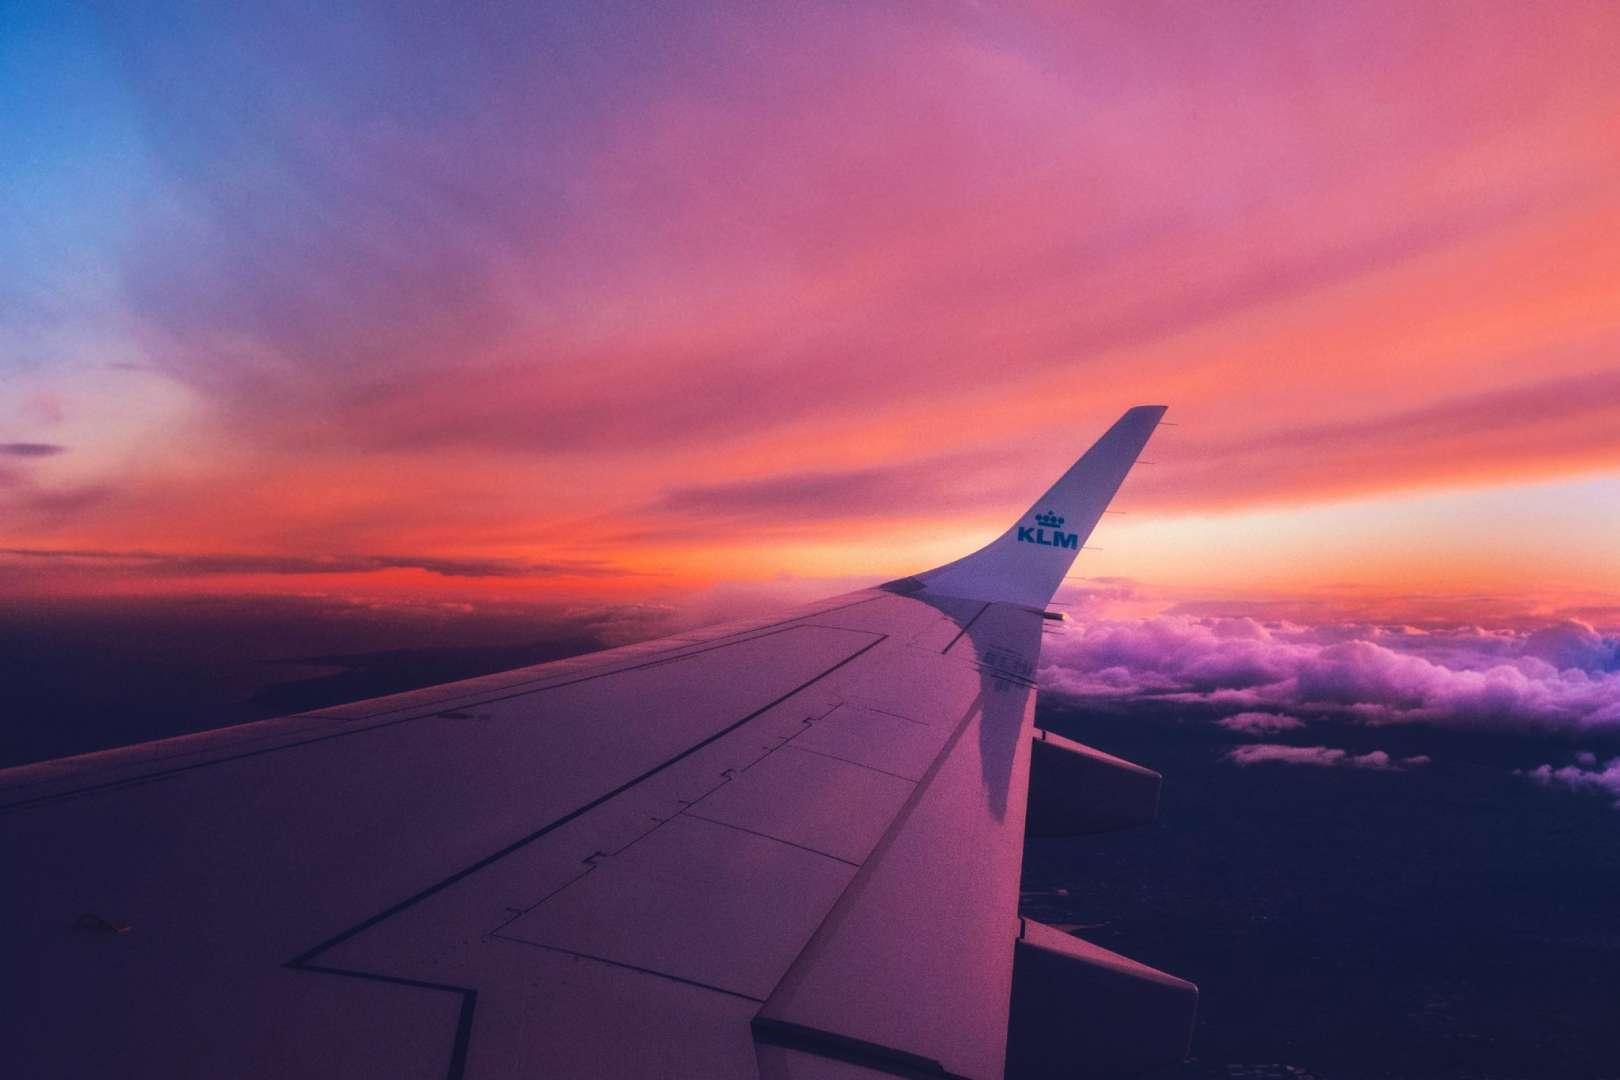 Aeroplane Wing During a Flight